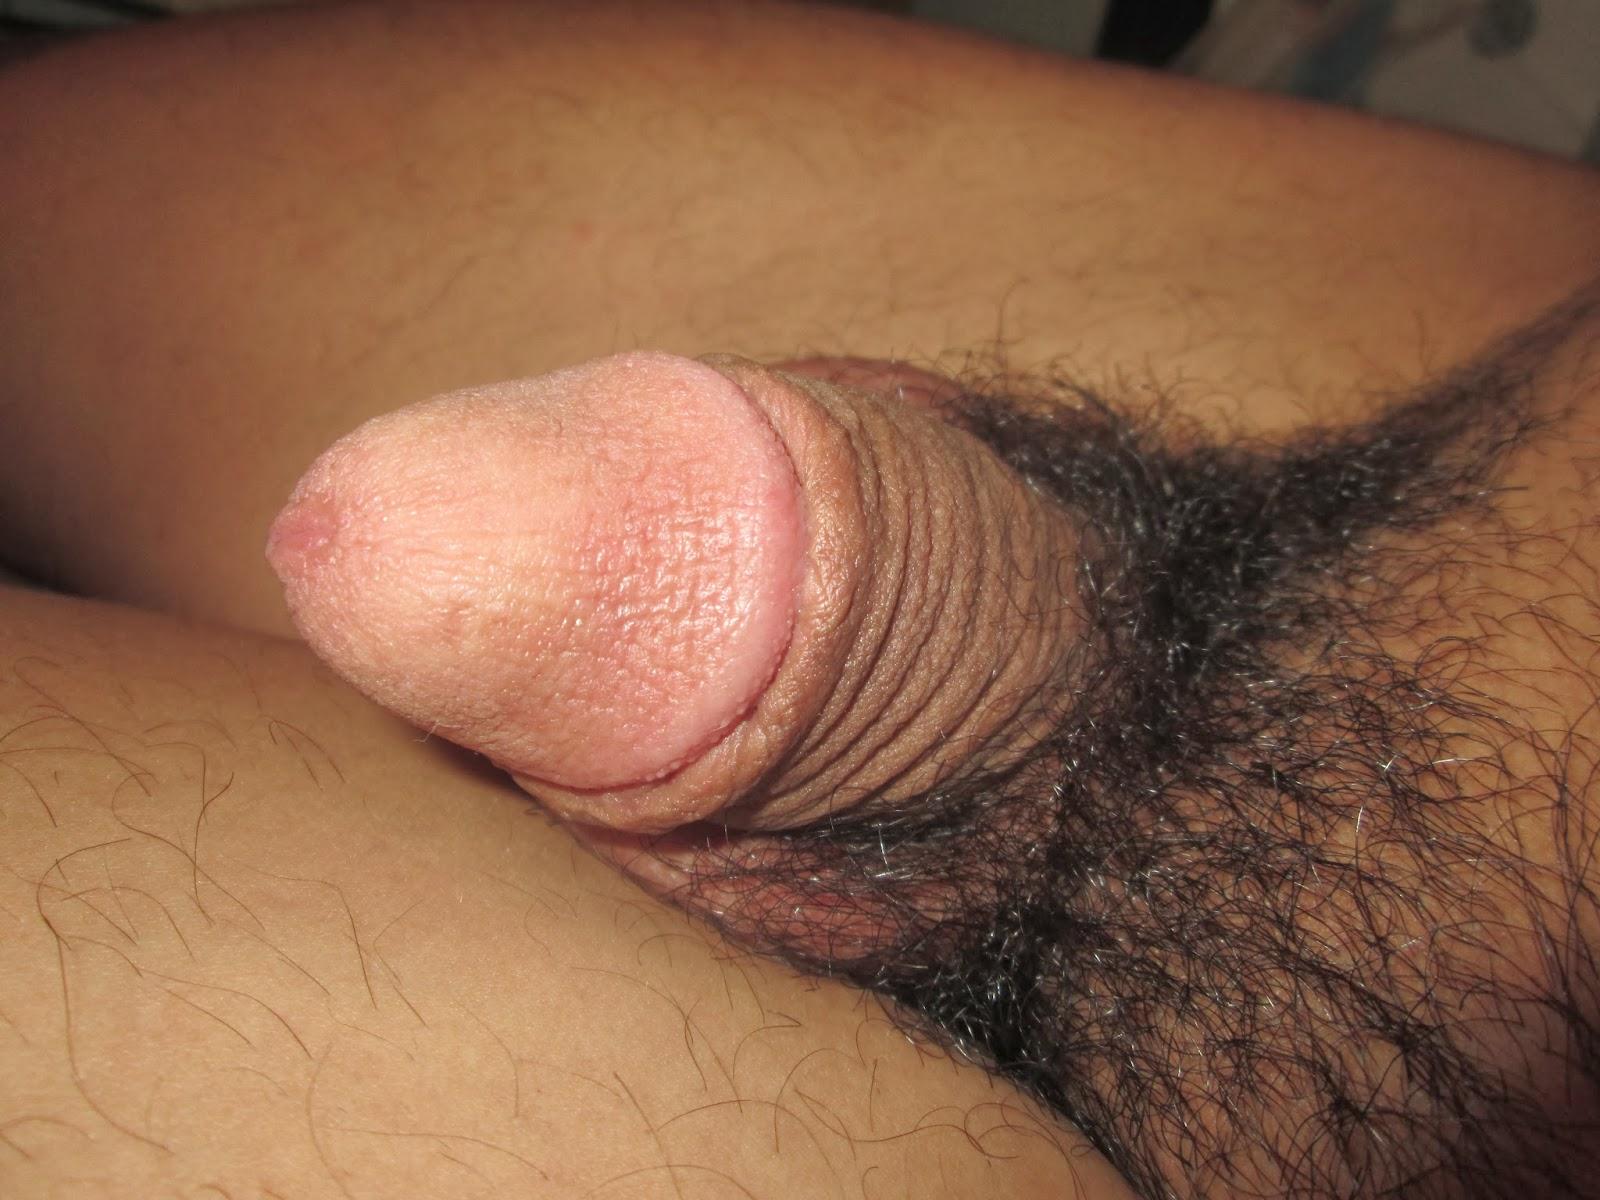 Circumcision - Sensitivity, Sensation and Sexual Function